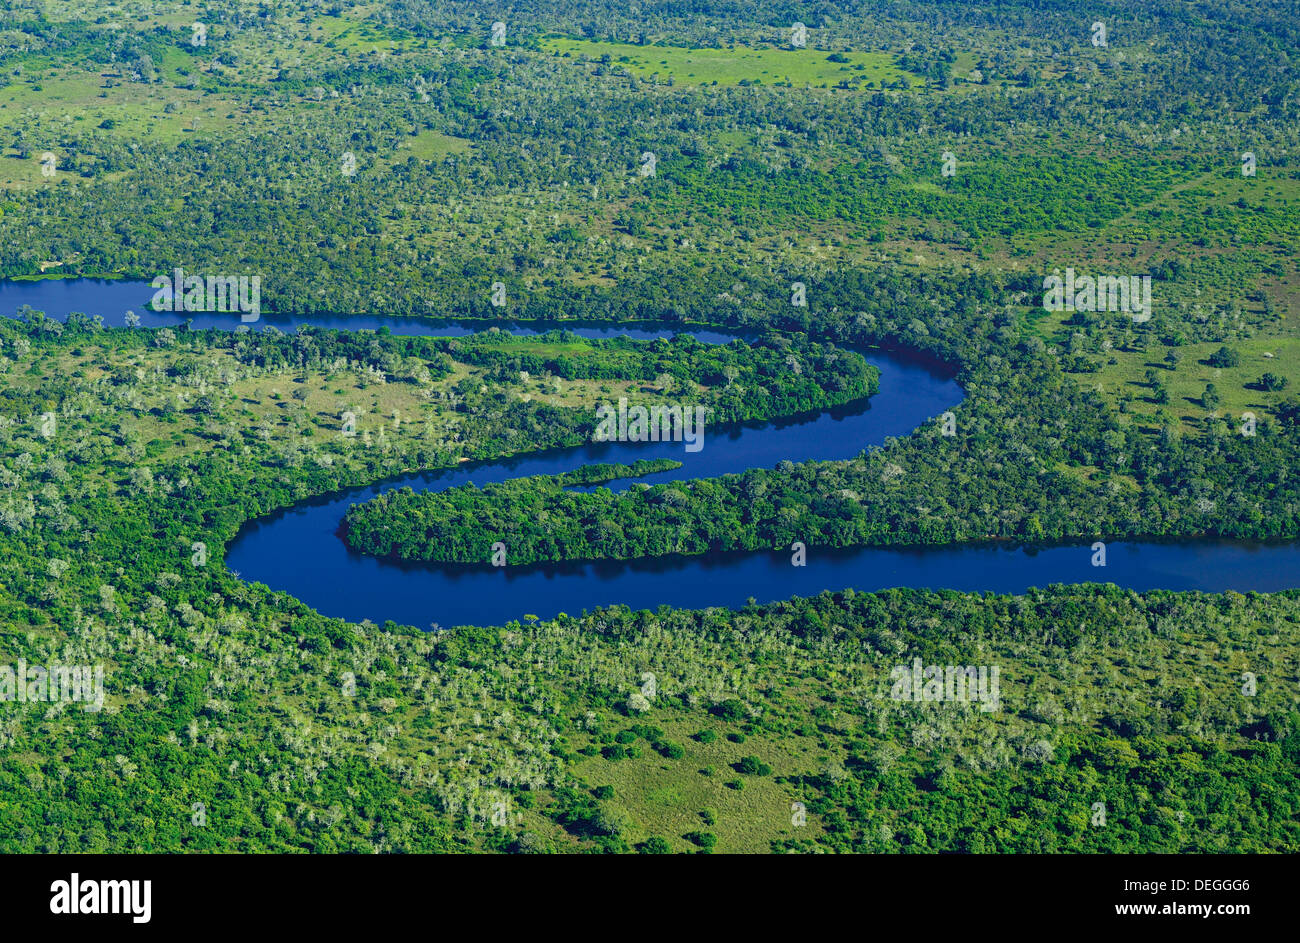 Brasilien, Pantanal: Luftaufnahme des Flusses in der Nähe von Poconé Claro Stockbild